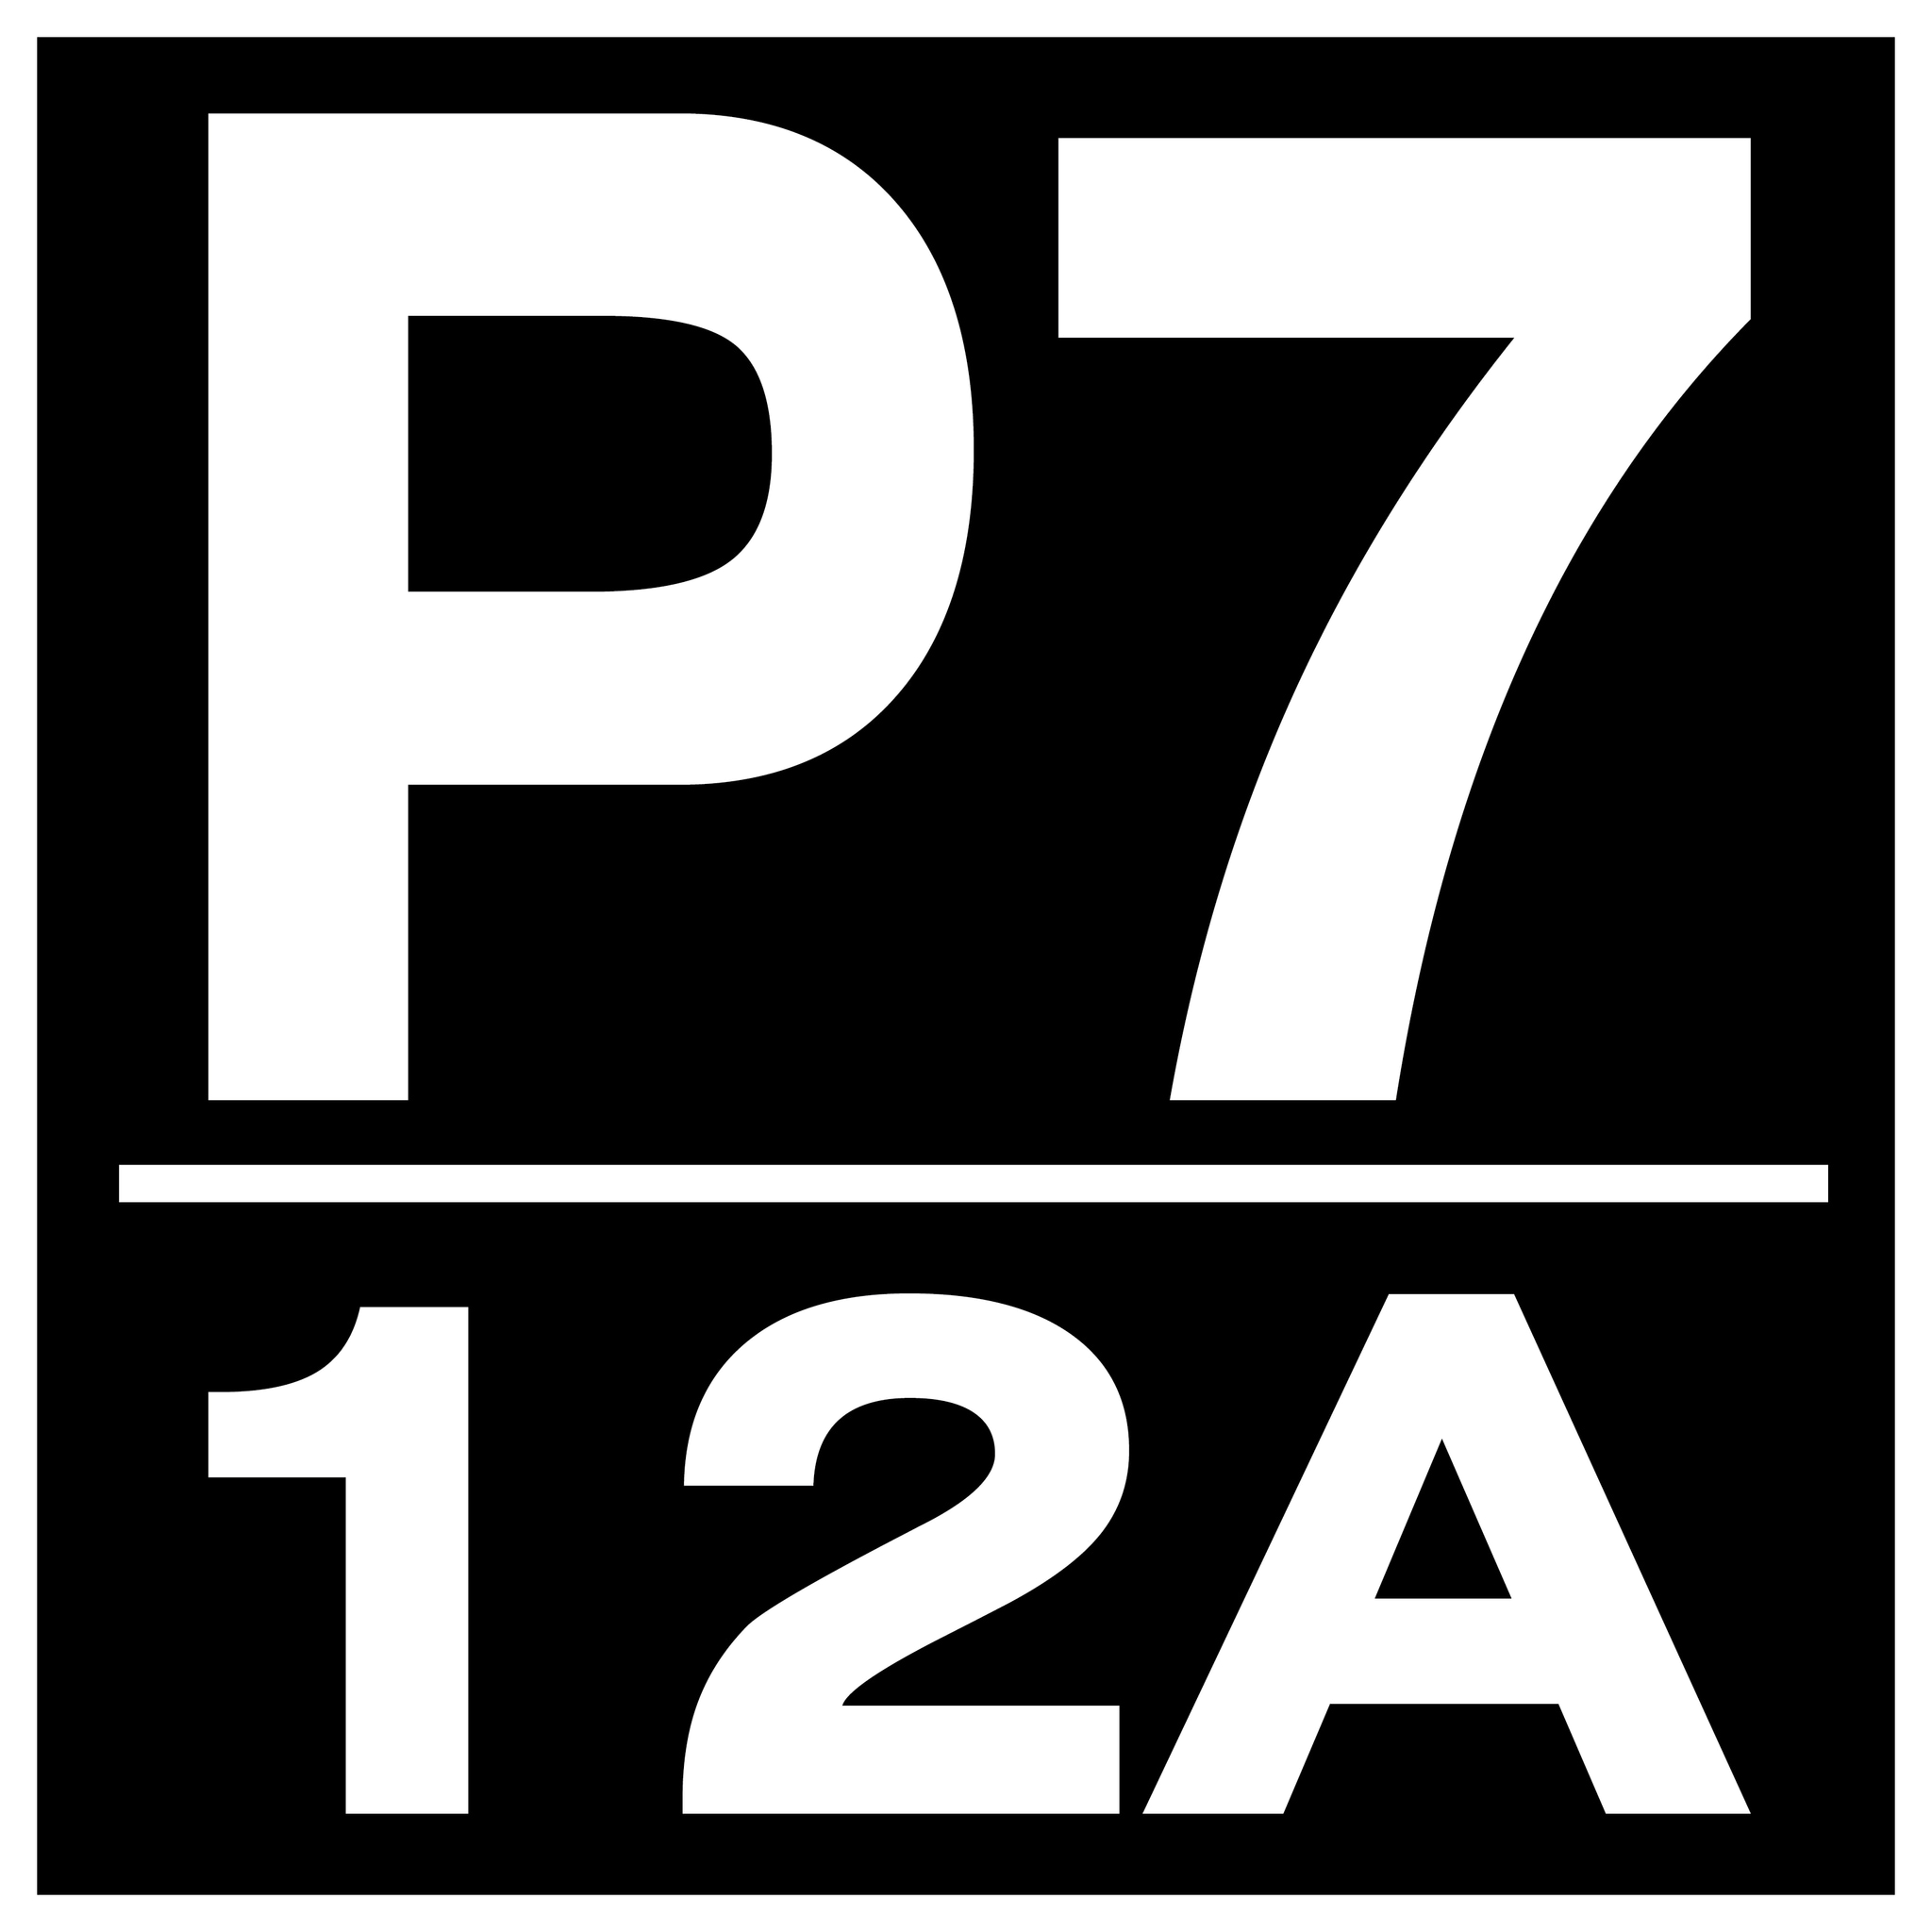 Jual Nomor Rumah Acrylic 25cm X 25cm Hitam Putih Bariska